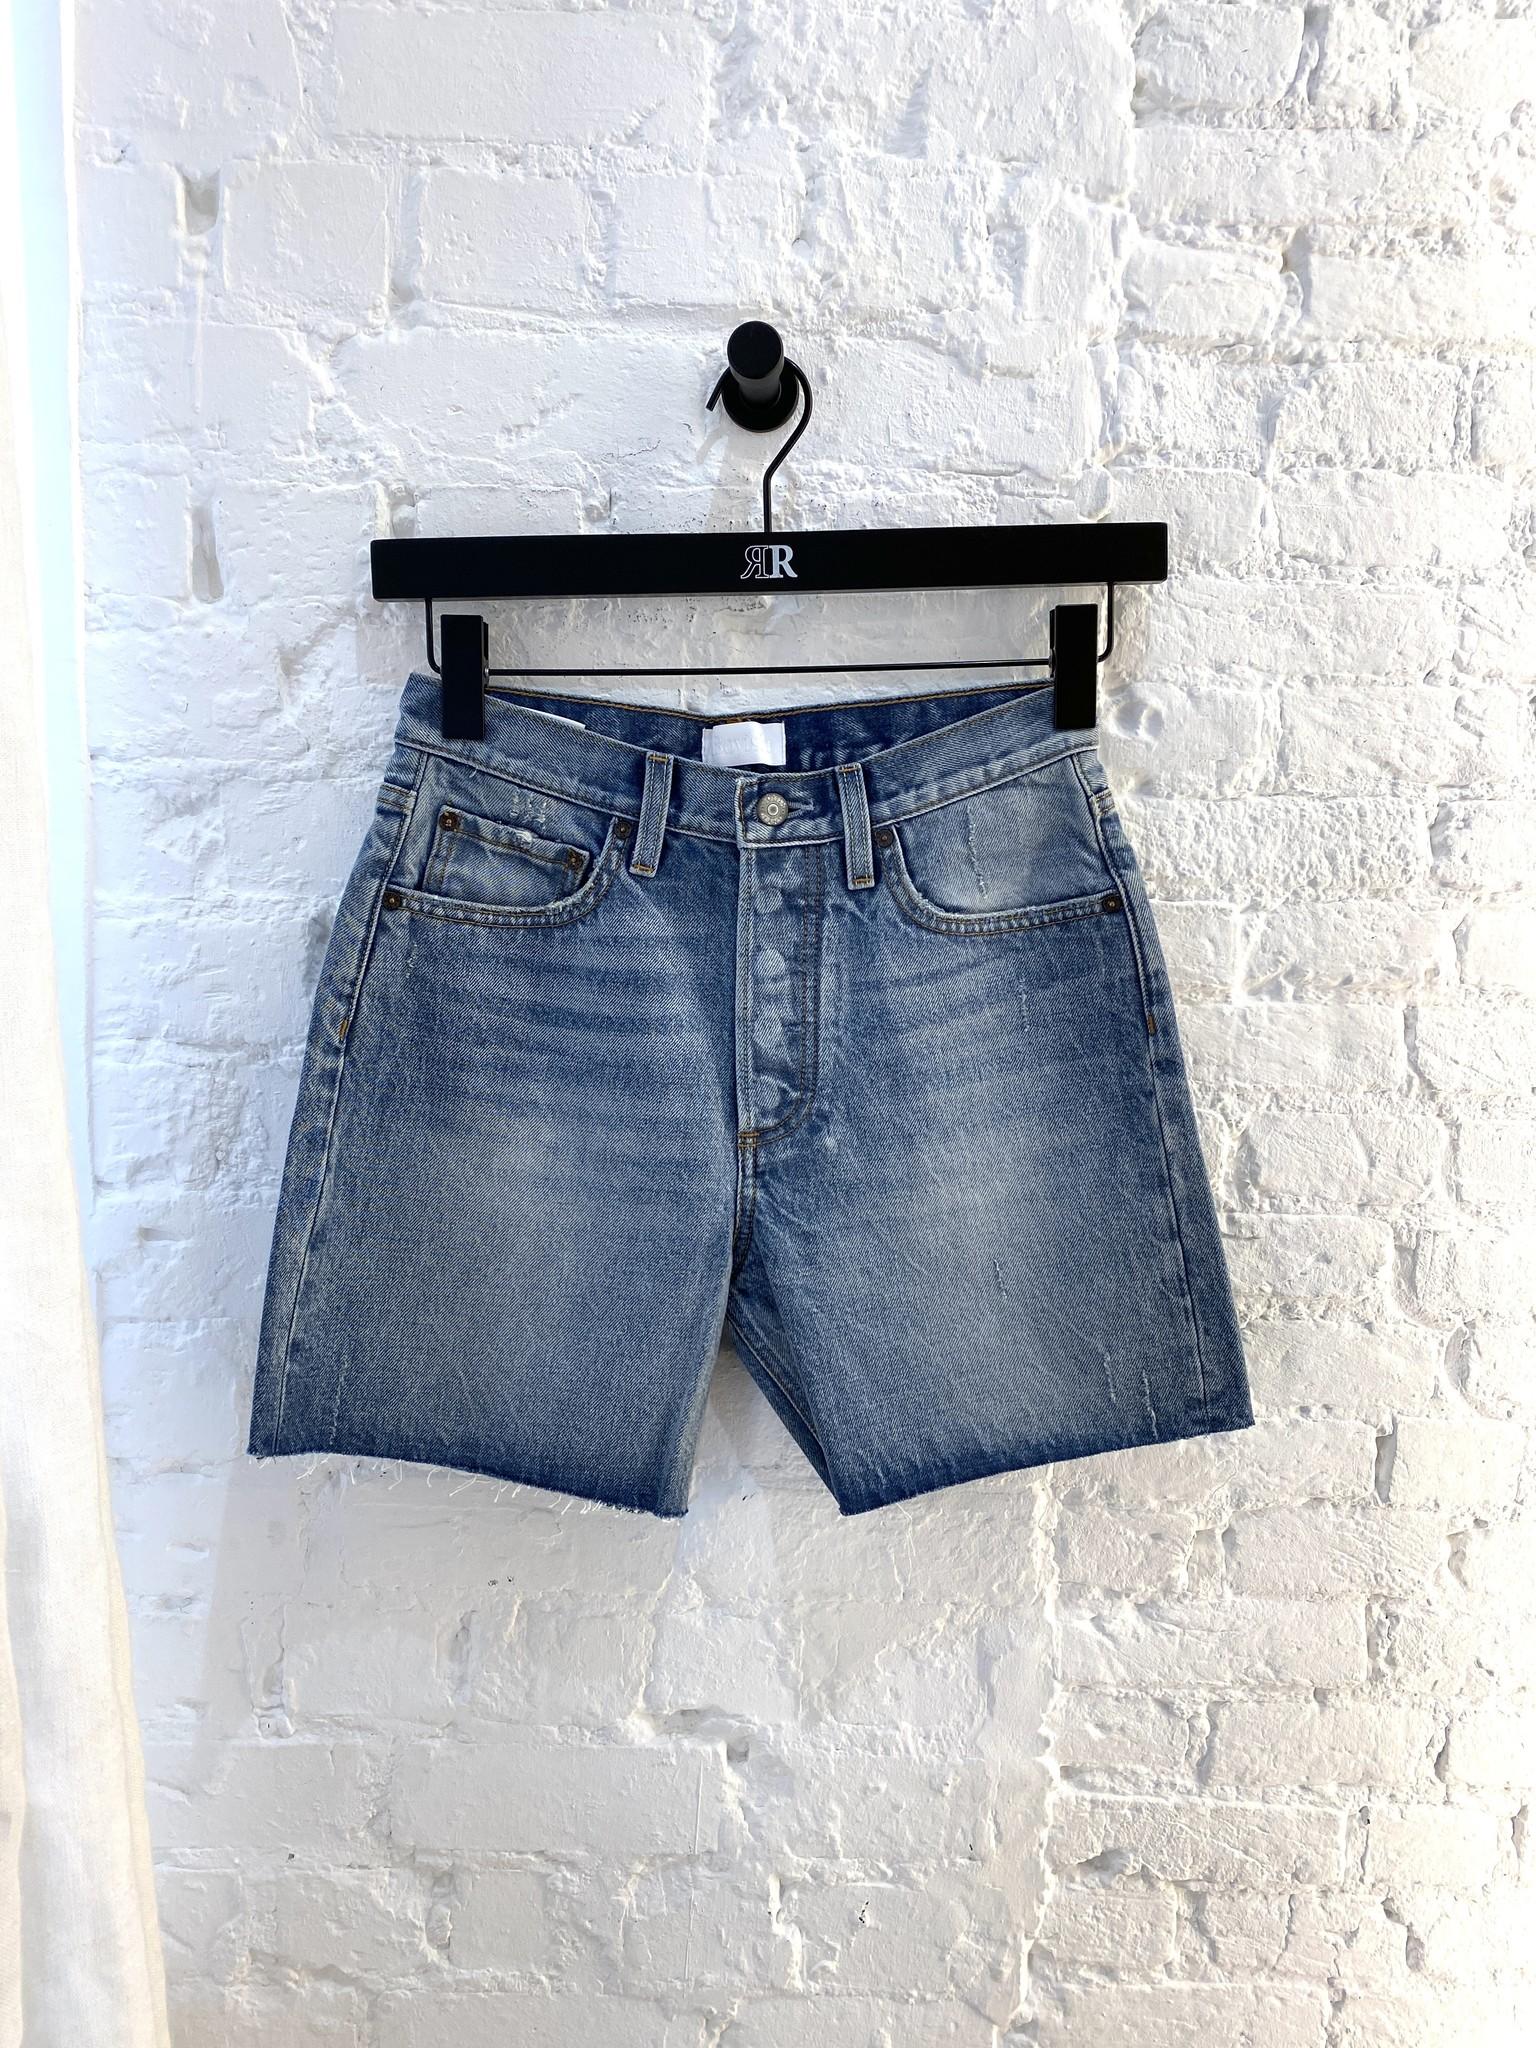 The Monty Jeans Short-1